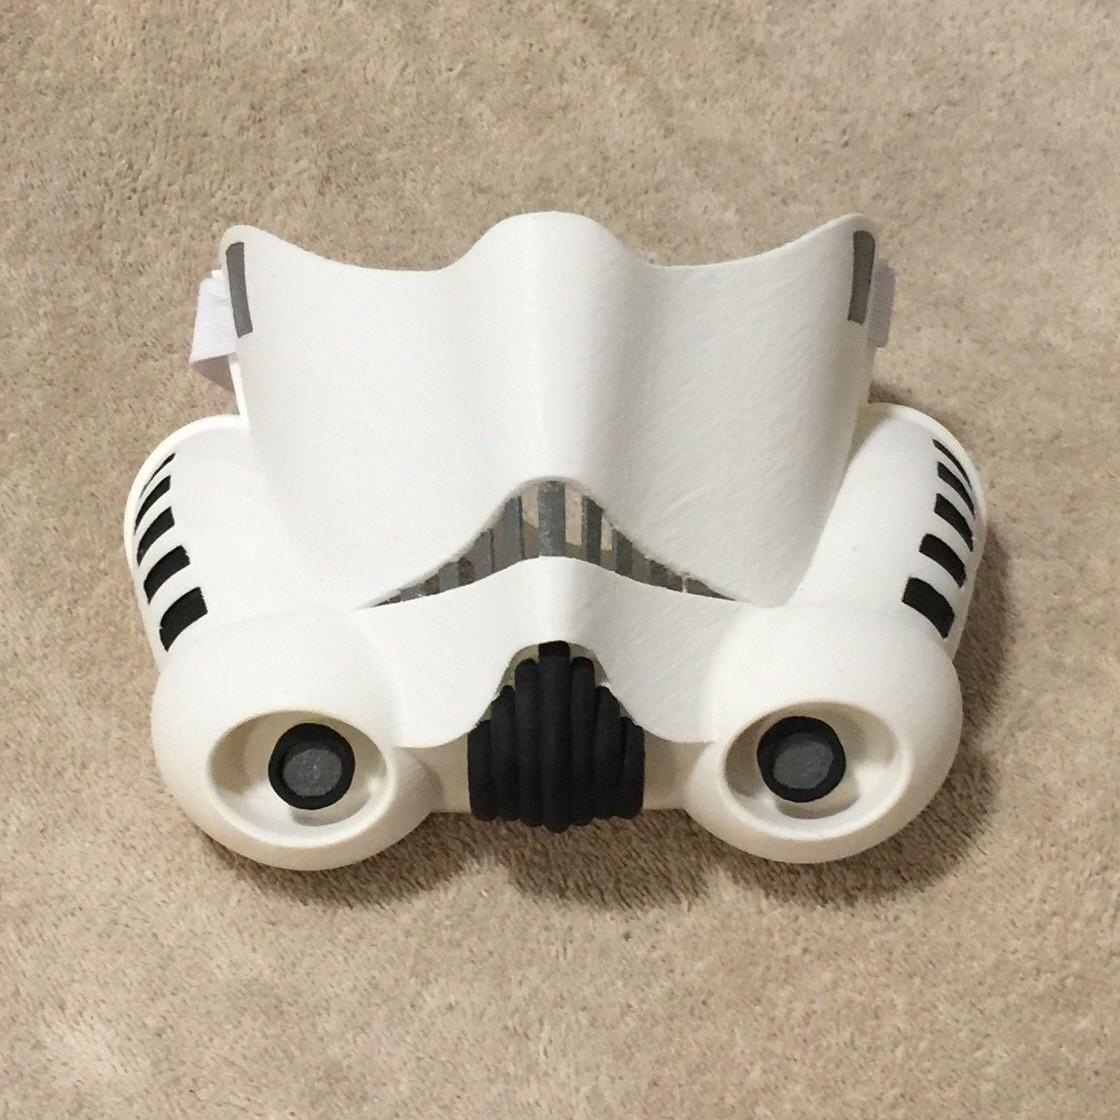 troop5.jpg Download STL file Stormtrooper Face Mask • Object to 3D print, Thatsick